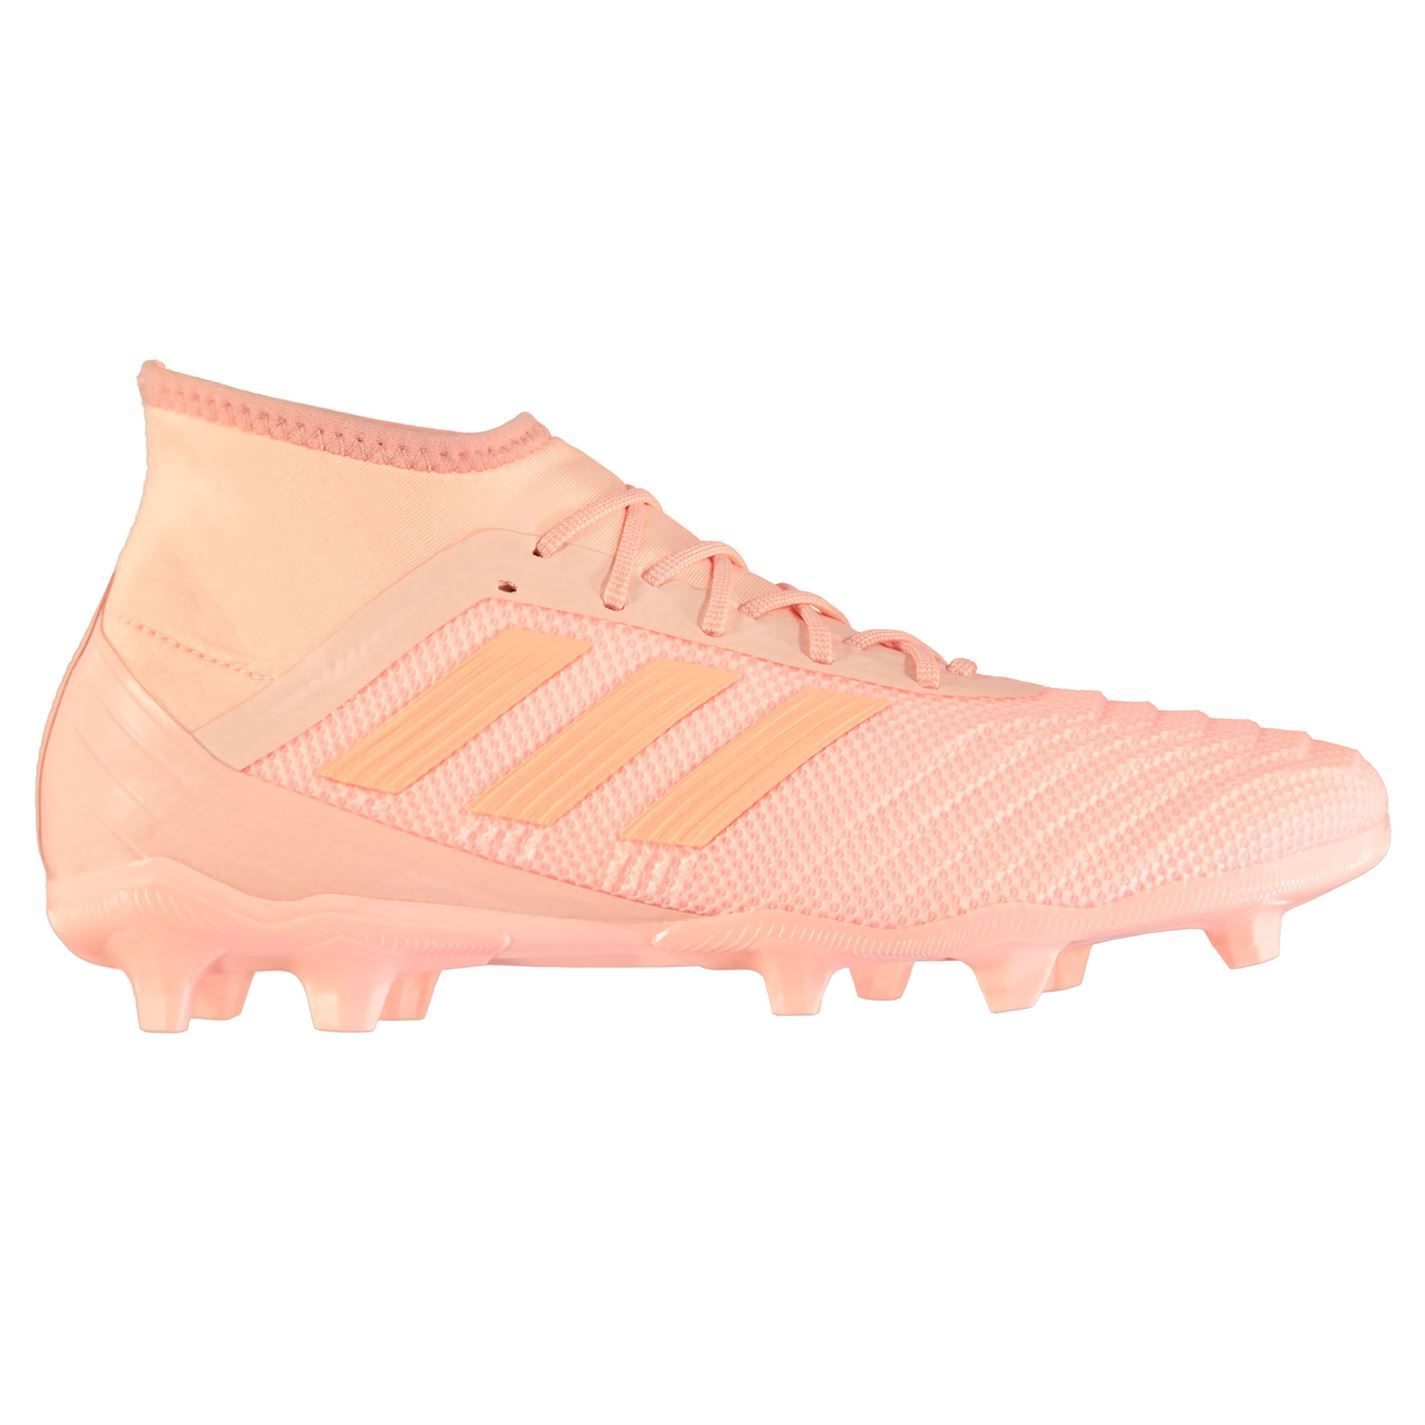 Adidas-Predator-18-2-FG-Firm-Ground-Chaussures-De-Football-Homme-Football-Chaussures-Crampons miniature 3